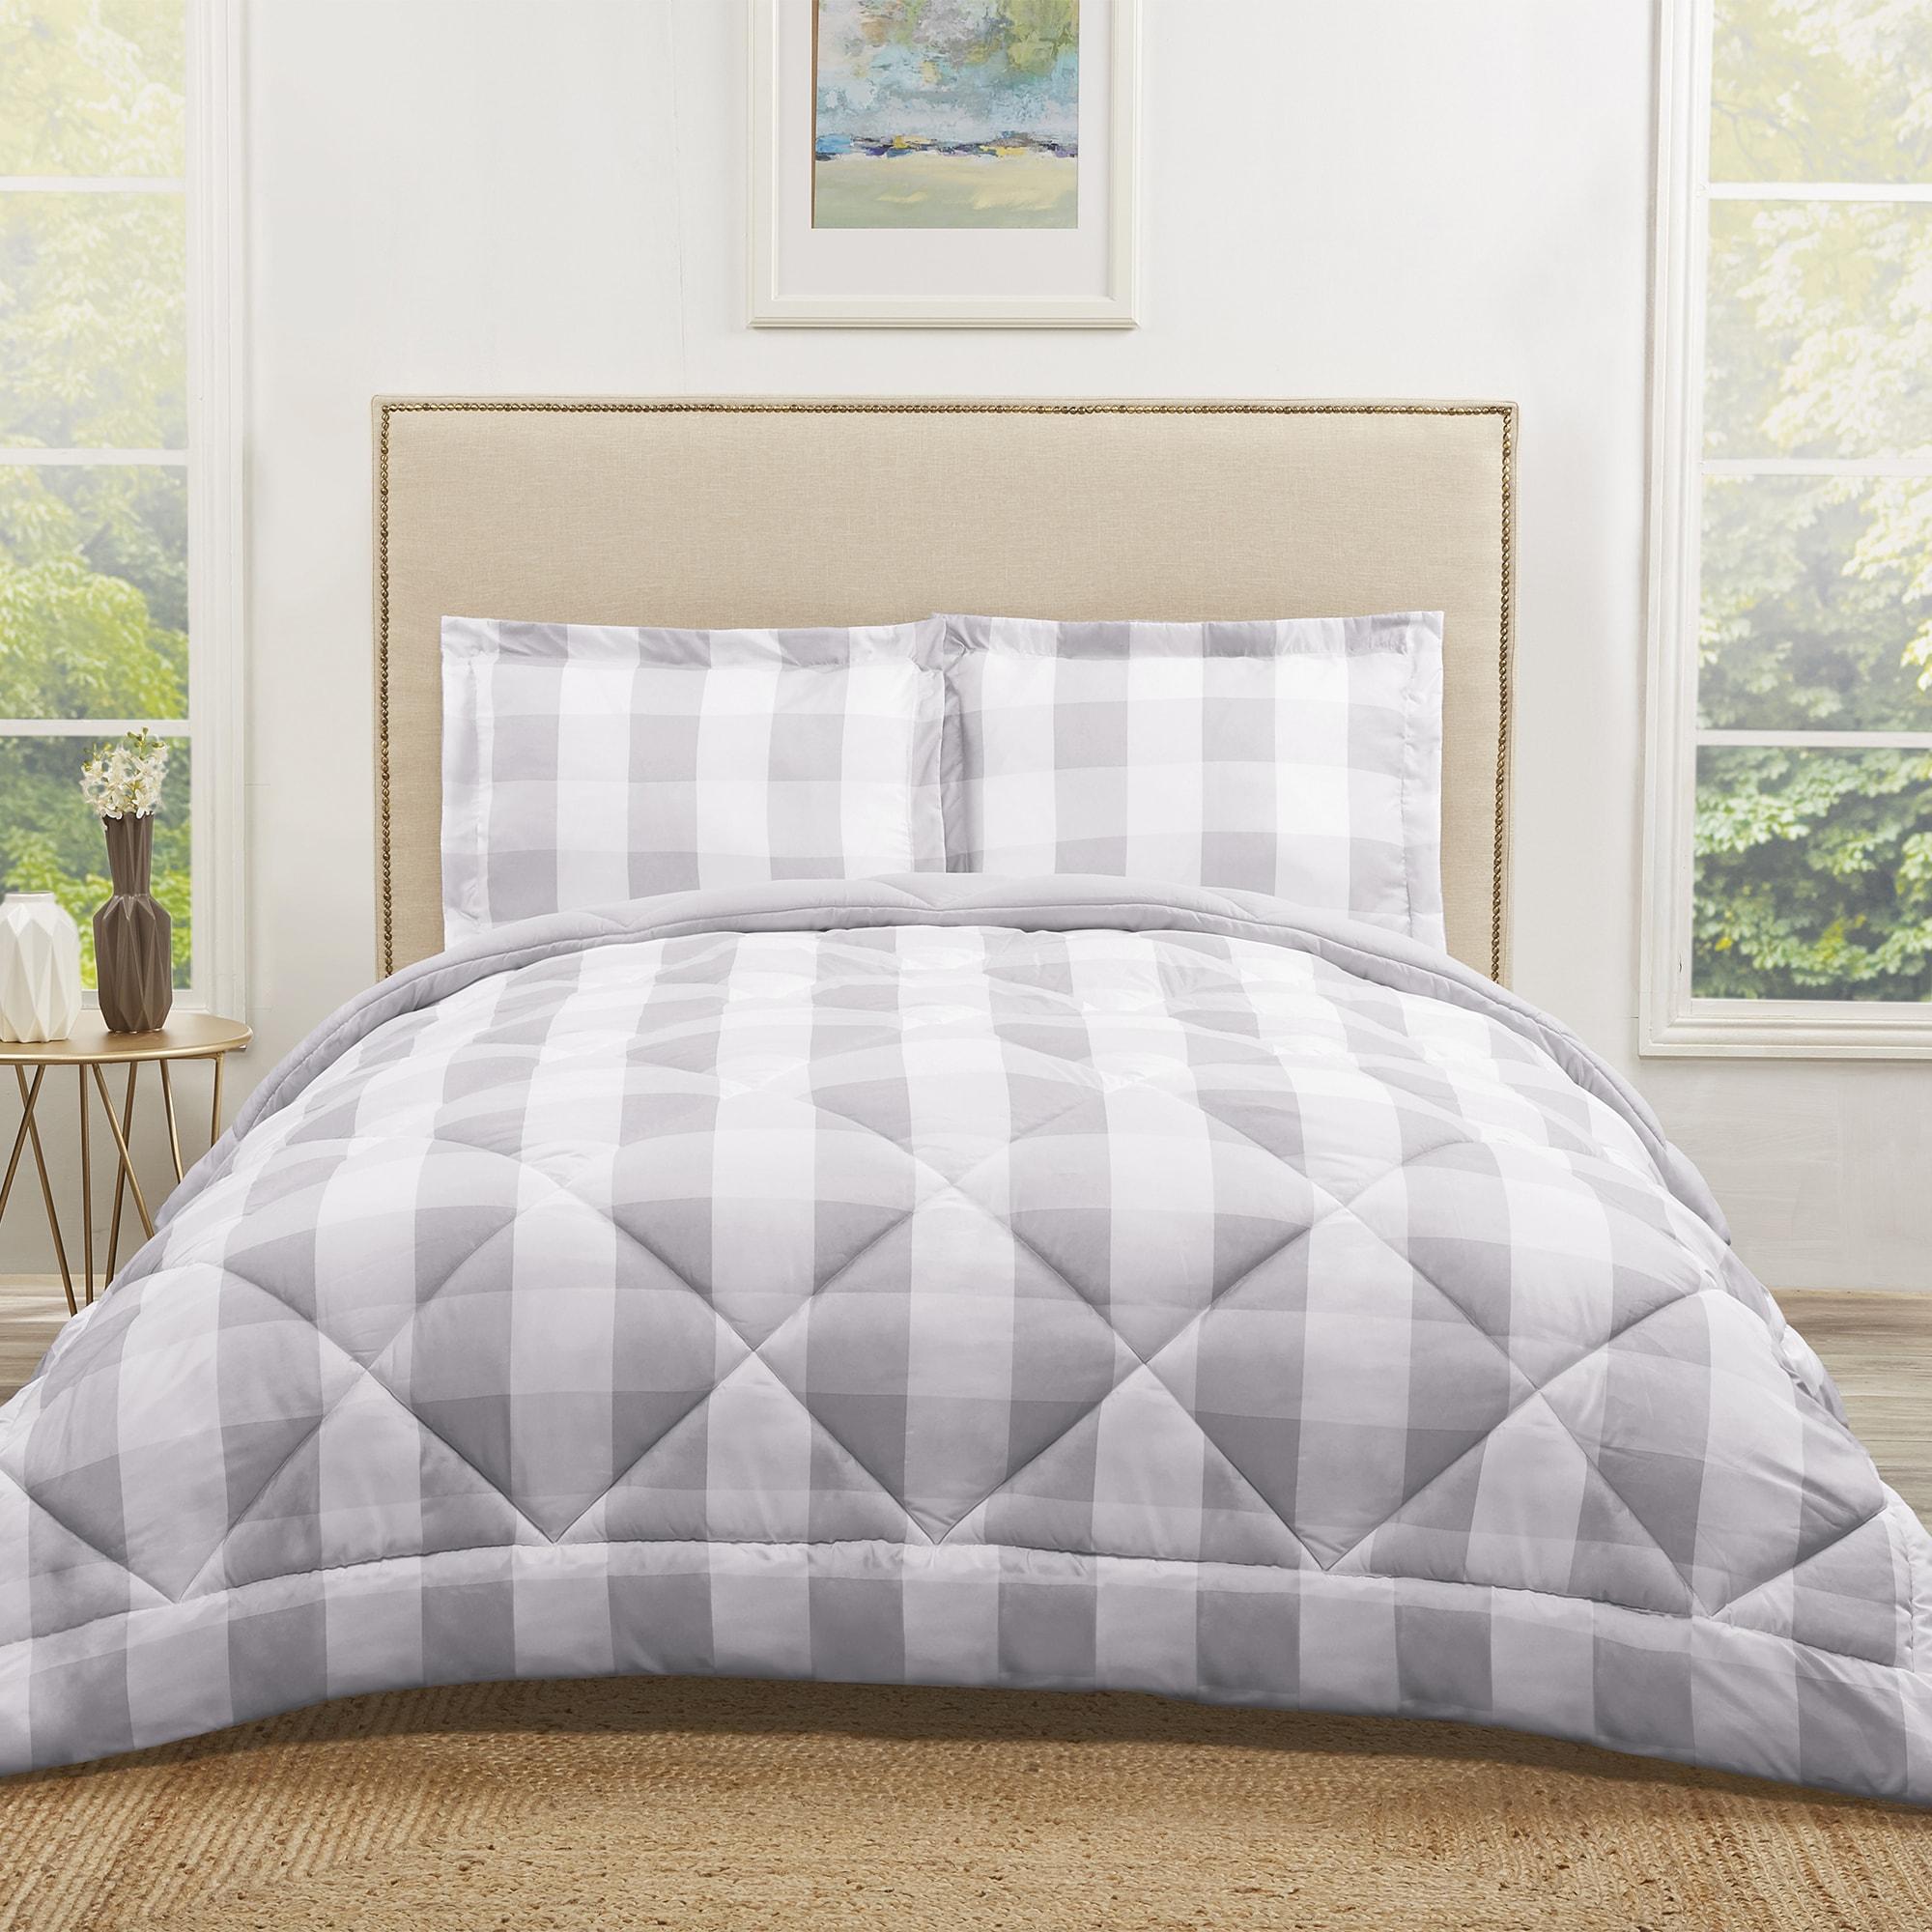 check ecrins to lodge choose buffalo plaid comforter set ideas design